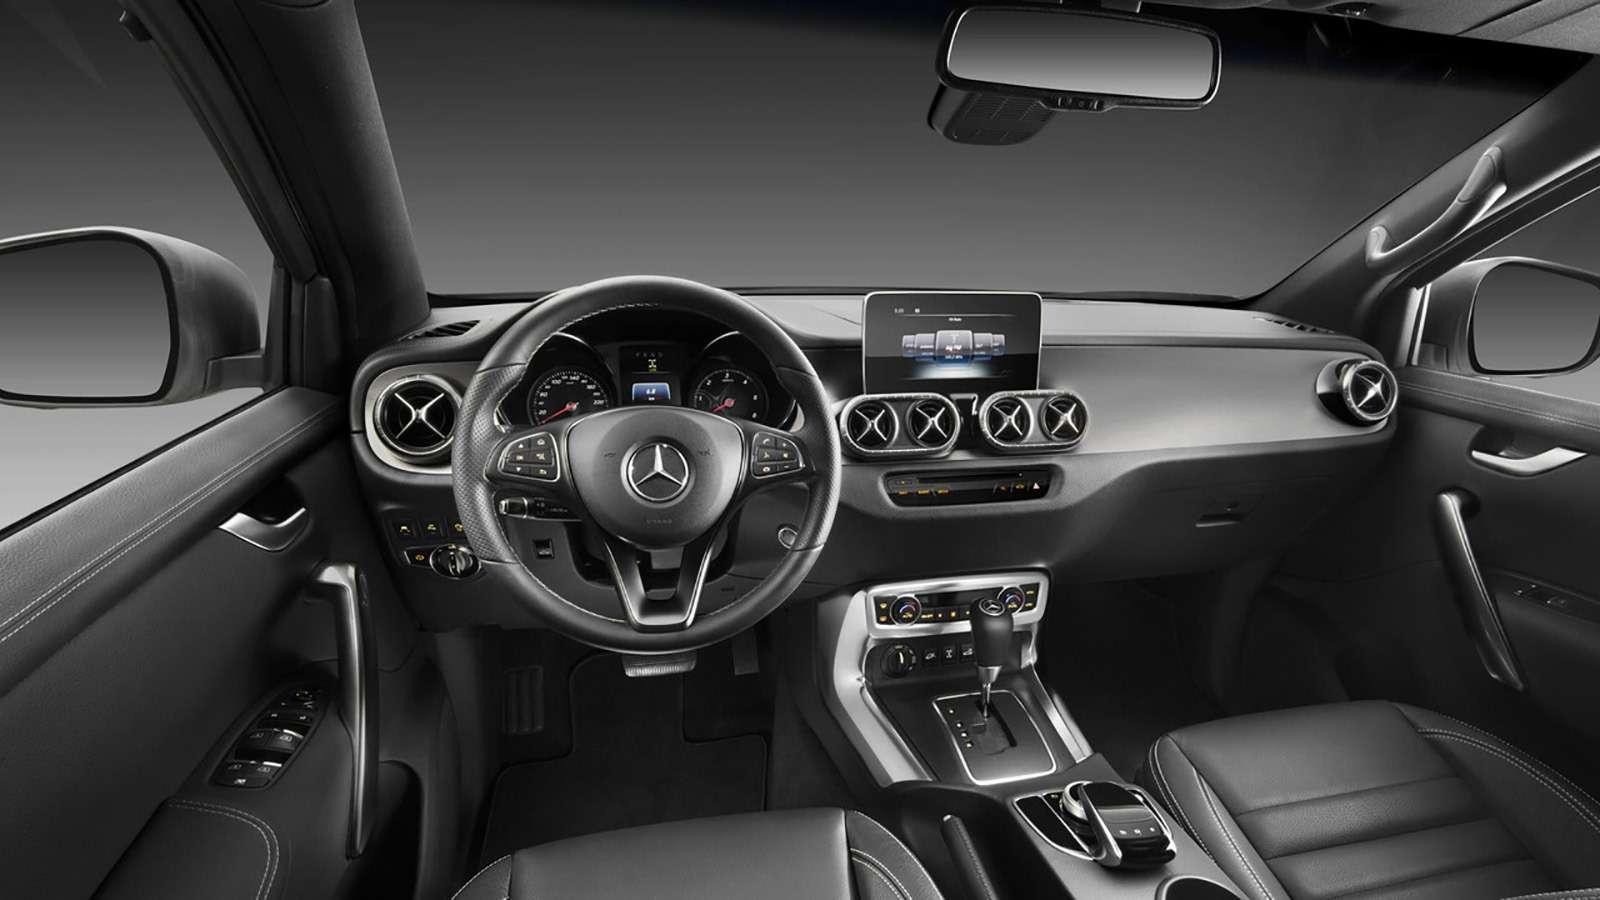 Mercedes-Benz X-класса: пружины вместо рессор— фото 775877